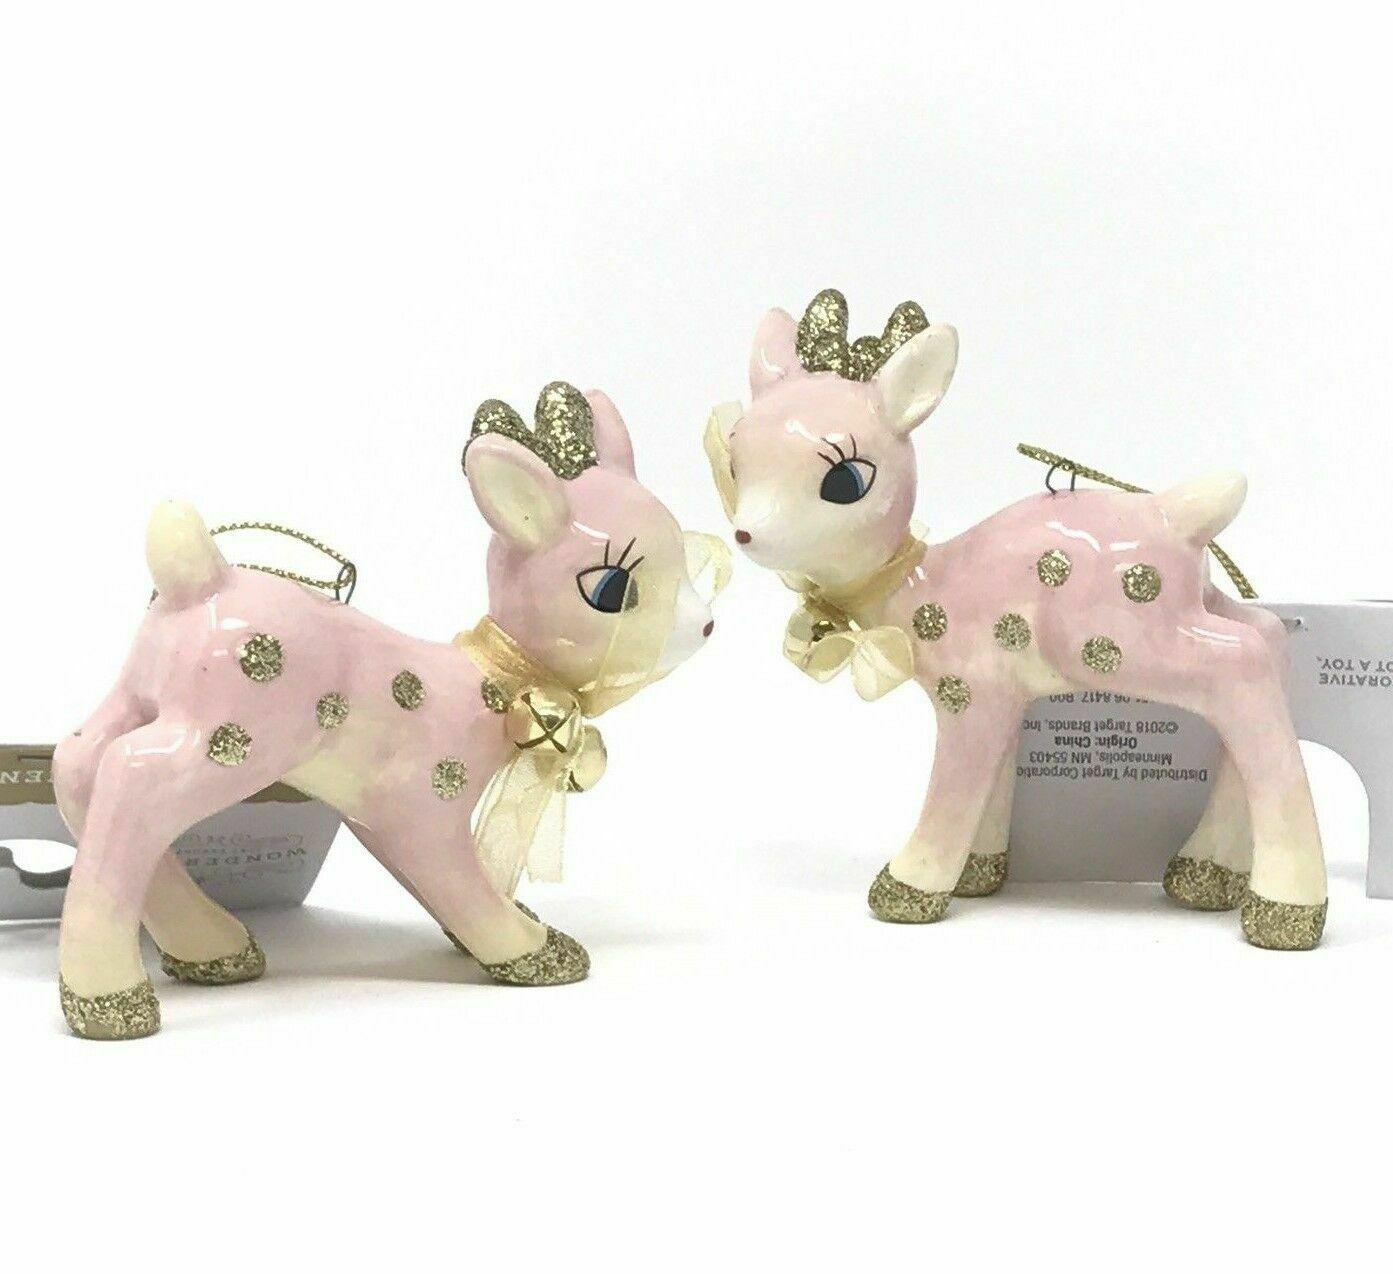 Lot of 2 Target Wondershop Pink Retro Ceramic Deer Christmas Ornaments 2018 NEW